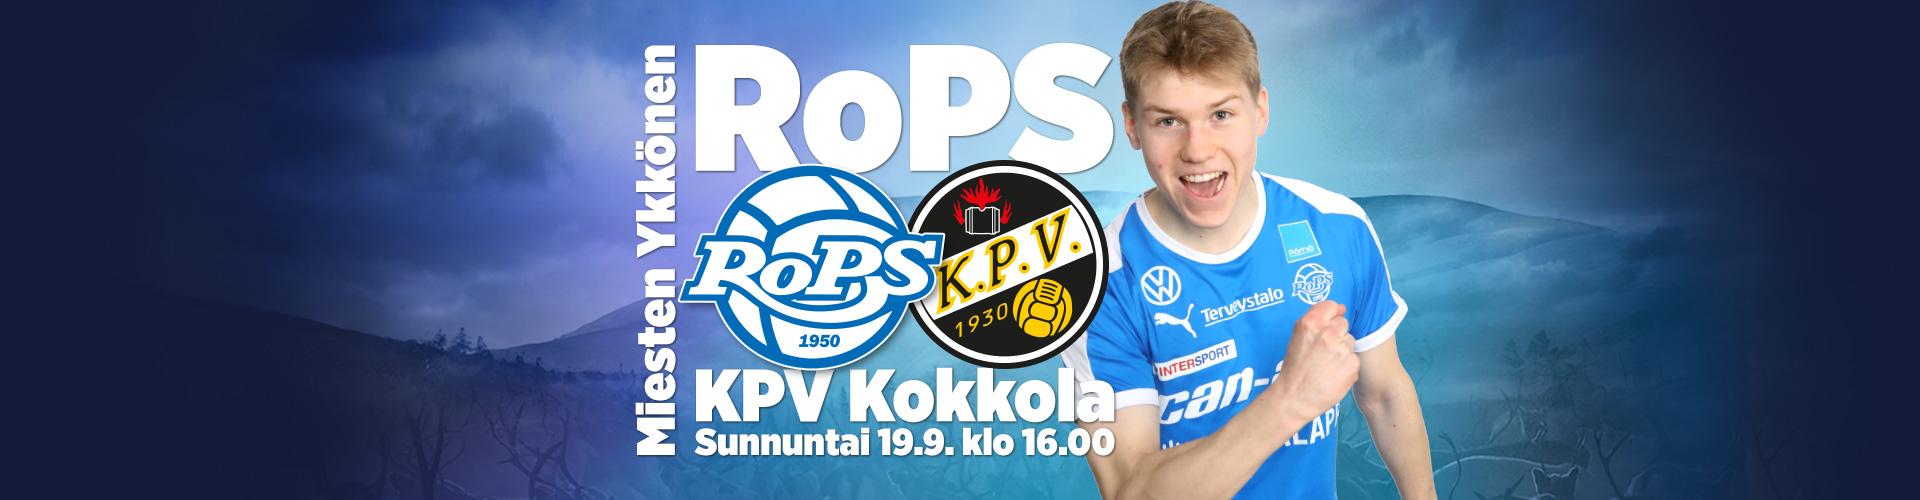 RoPS-KPV